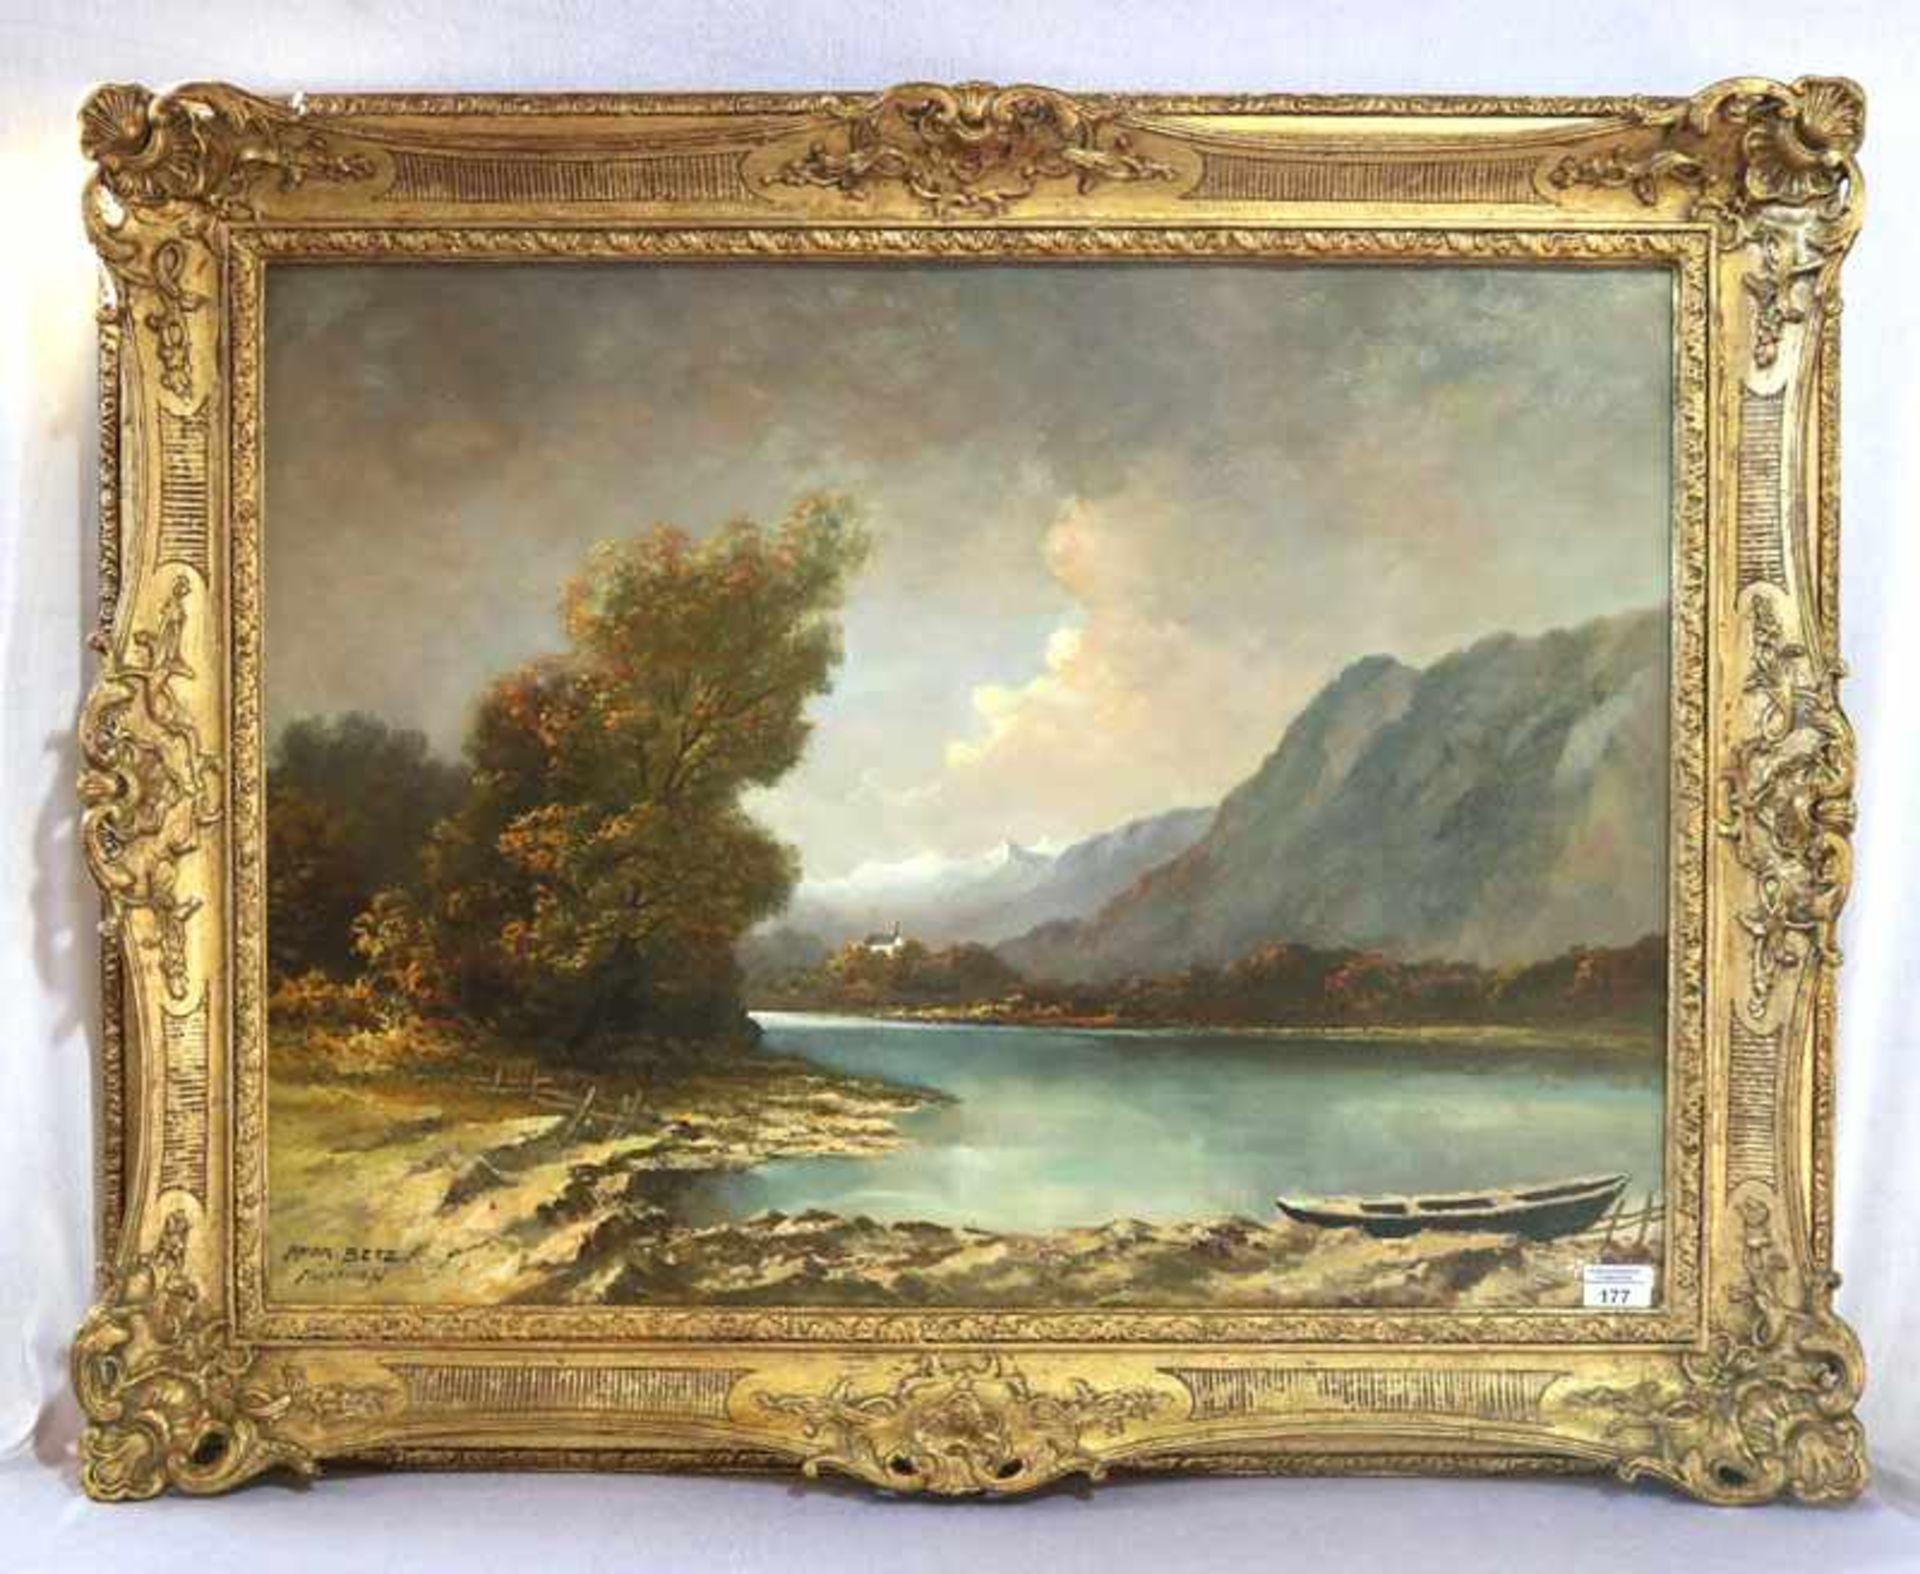 Los 177 - Gemälde ÖL/LW 'Gebirgslandschaft mit See und Ruderboot', signiert Andr. (Andreas) Betz, München, *